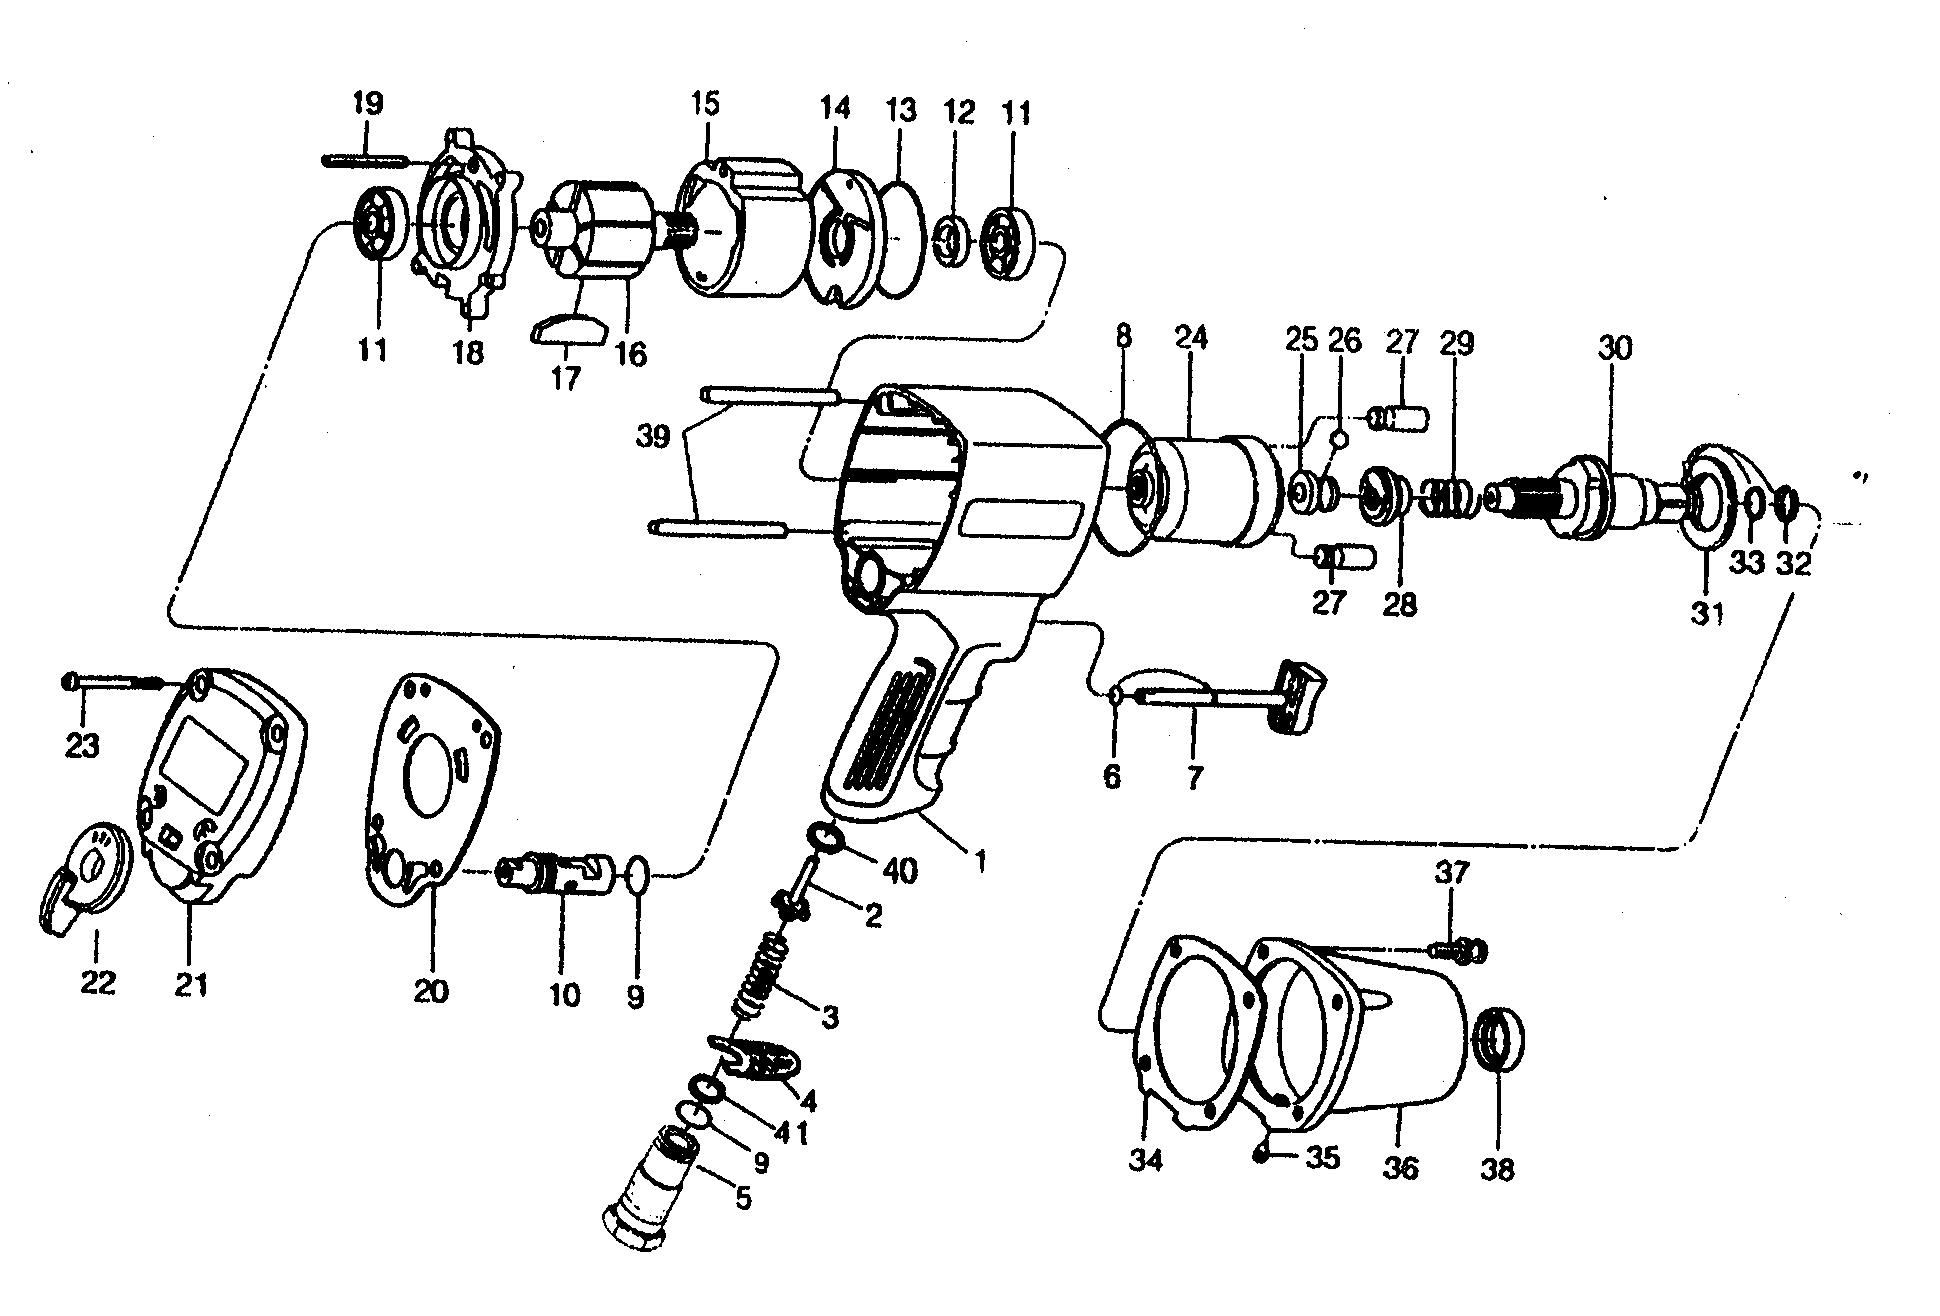 Matco Mt Impact Wrench Parts Diagram